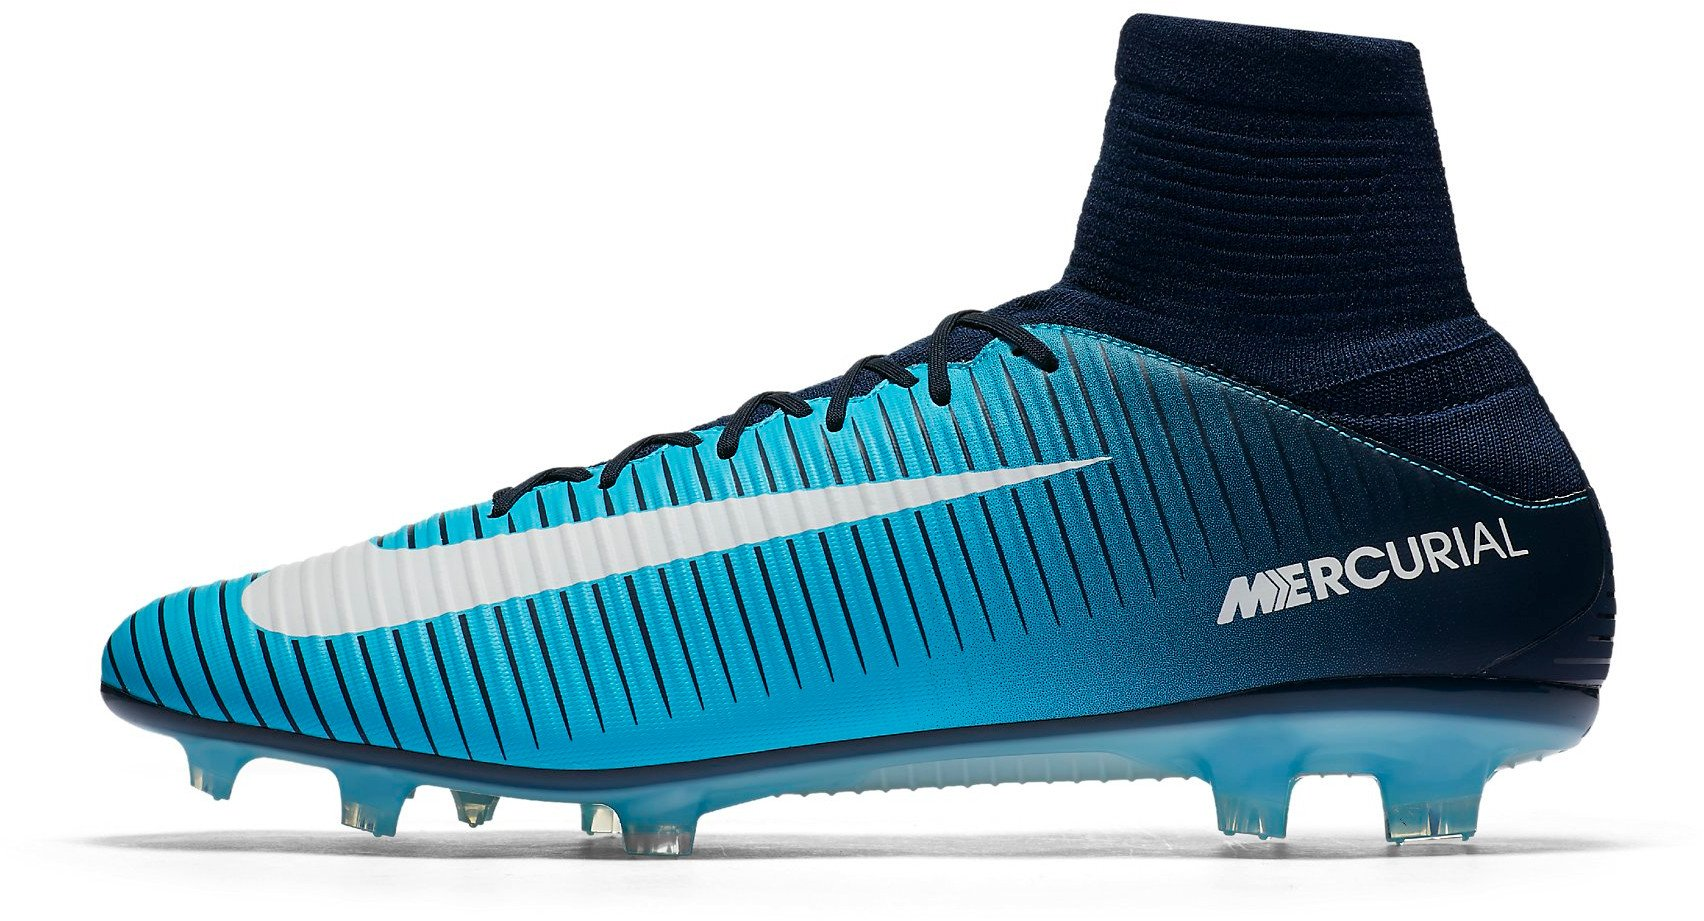 mayor jurar girasol  Football shoes Nike MERCURIAL VELOCE III DF FG - Top4Football.com